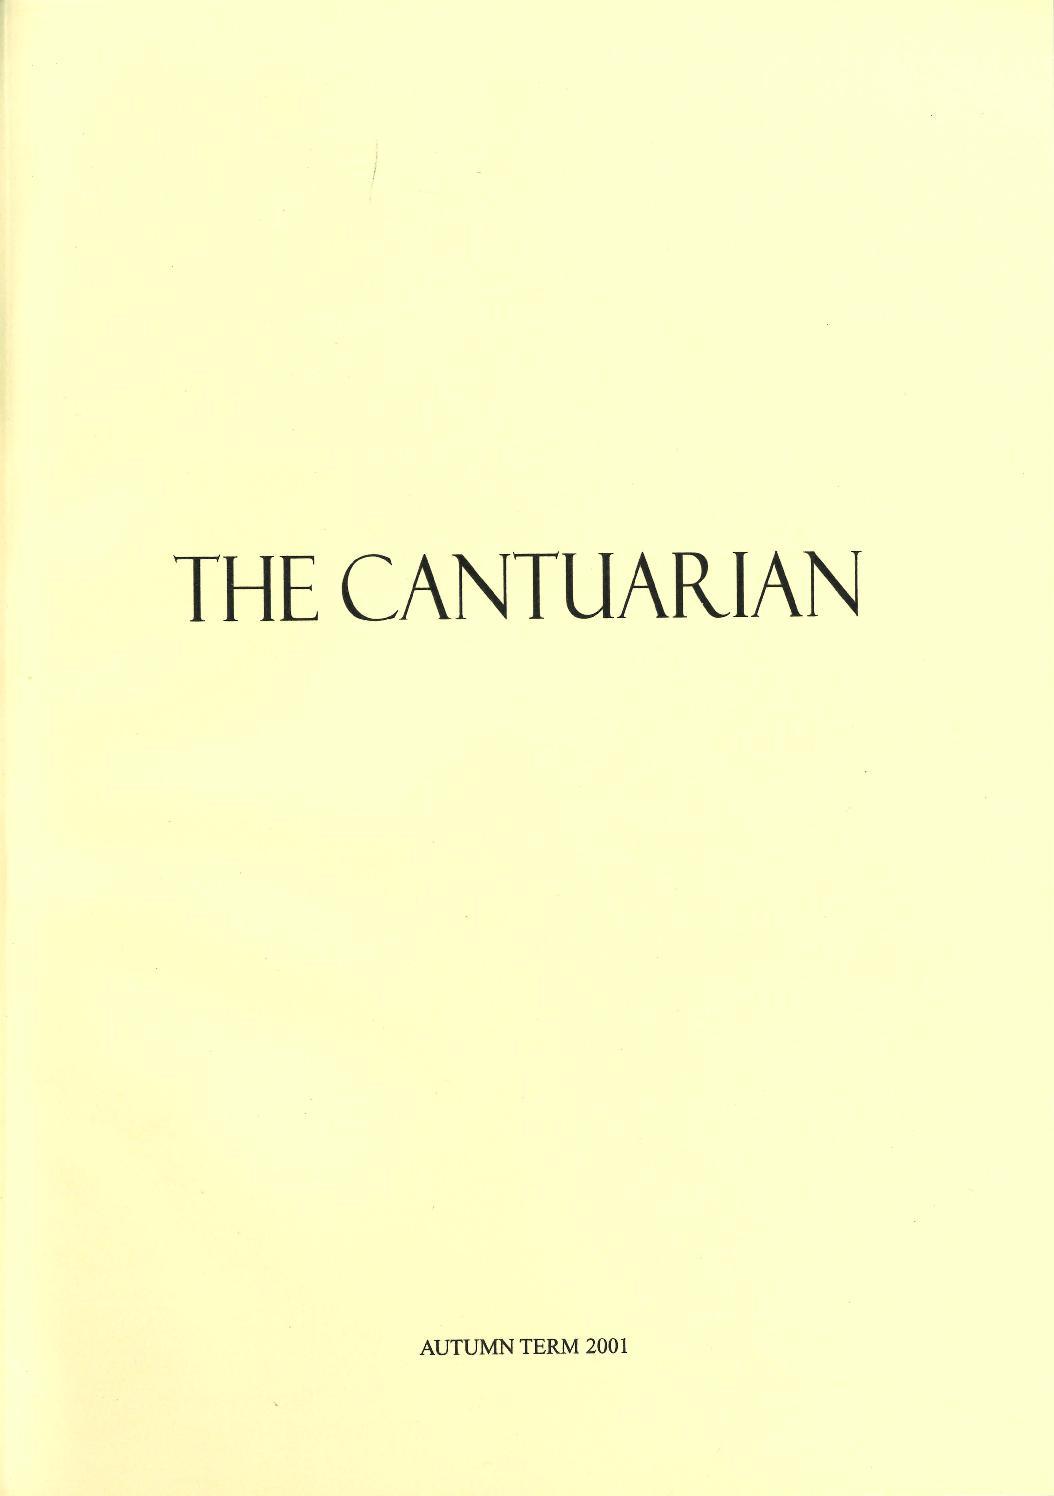 The Cantuarian Autumn 2001 Lent 2002 by OKS Association